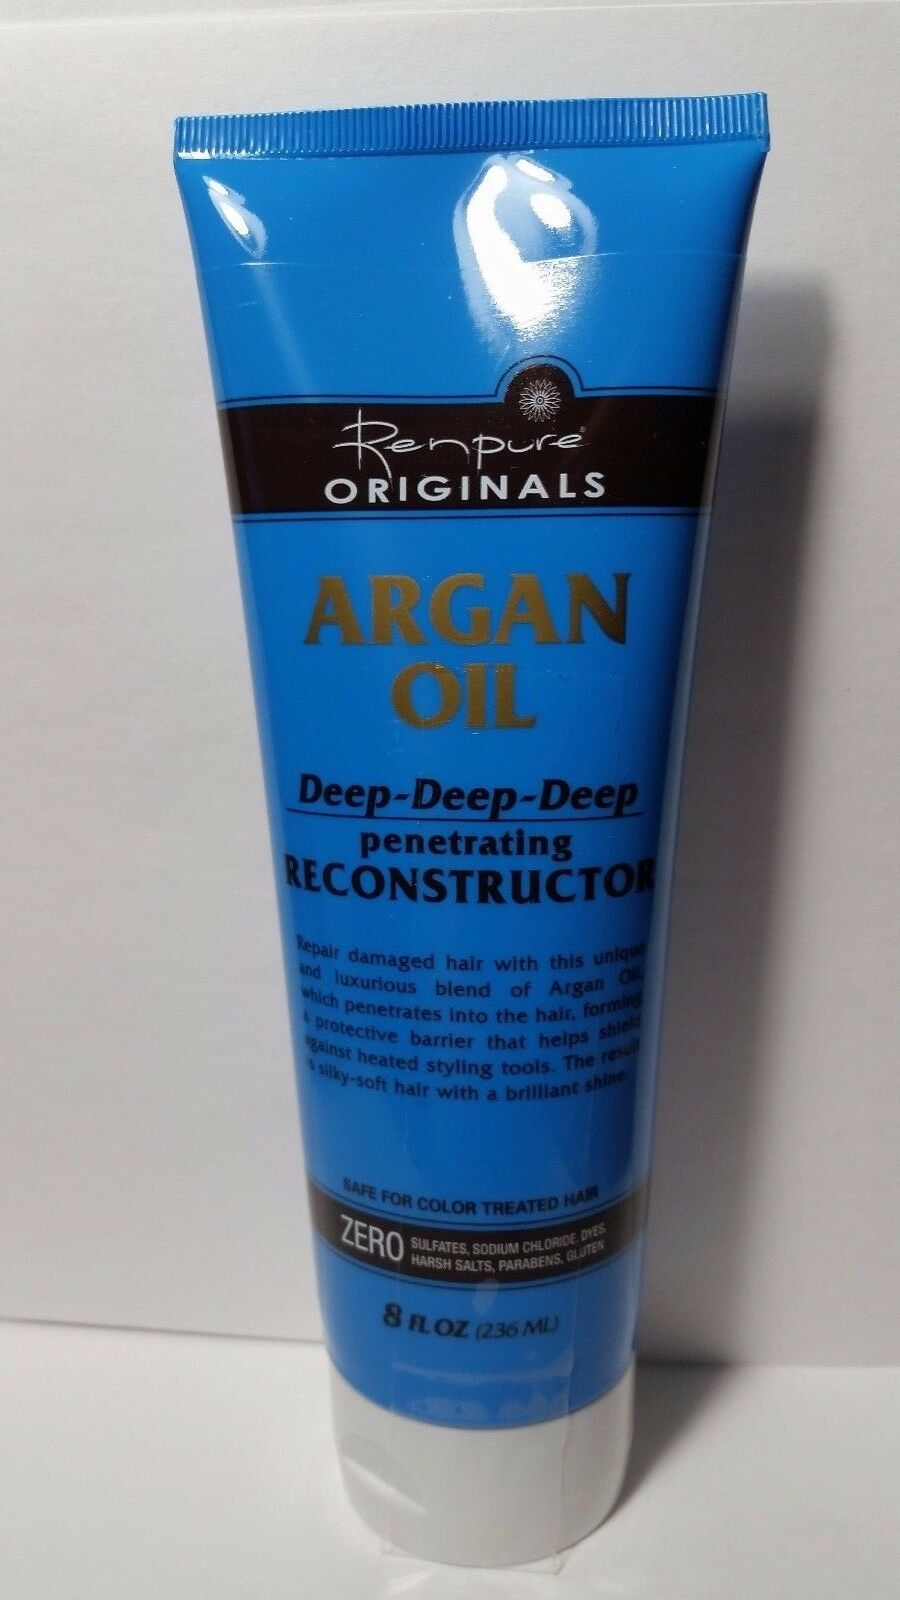 Renpure Argan Oil Deep-Deep-Deep Penetrating Reconstructor 8